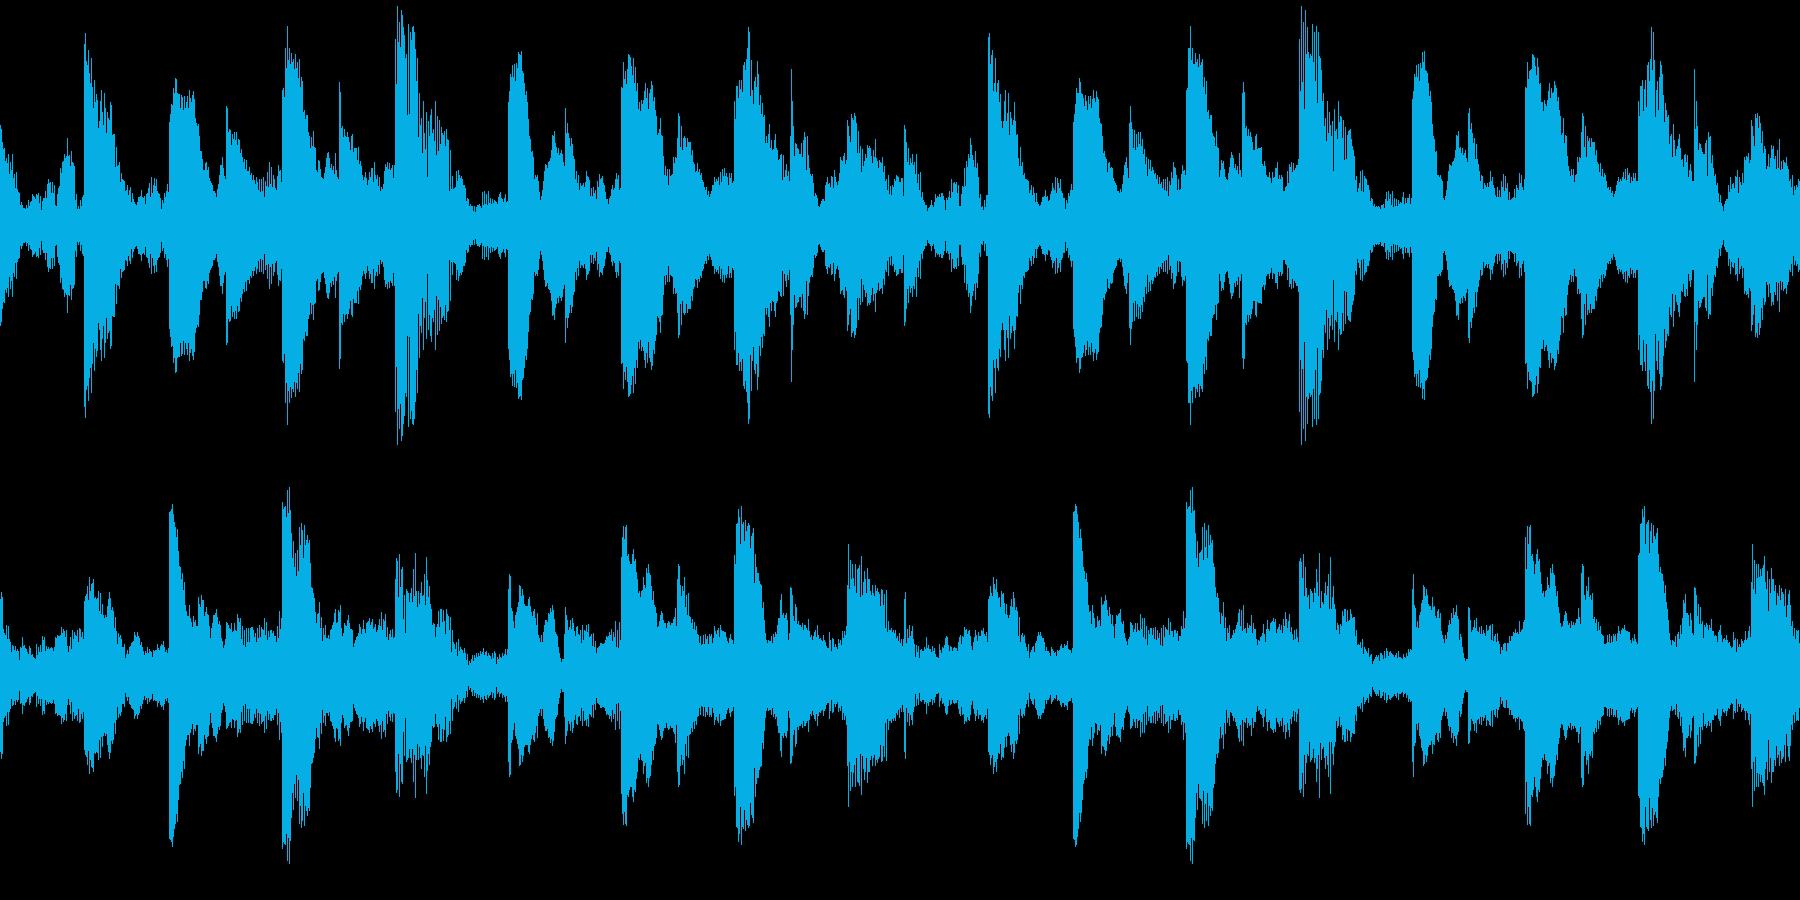 EDM リードシンセ 9 音楽制作用の再生済みの波形